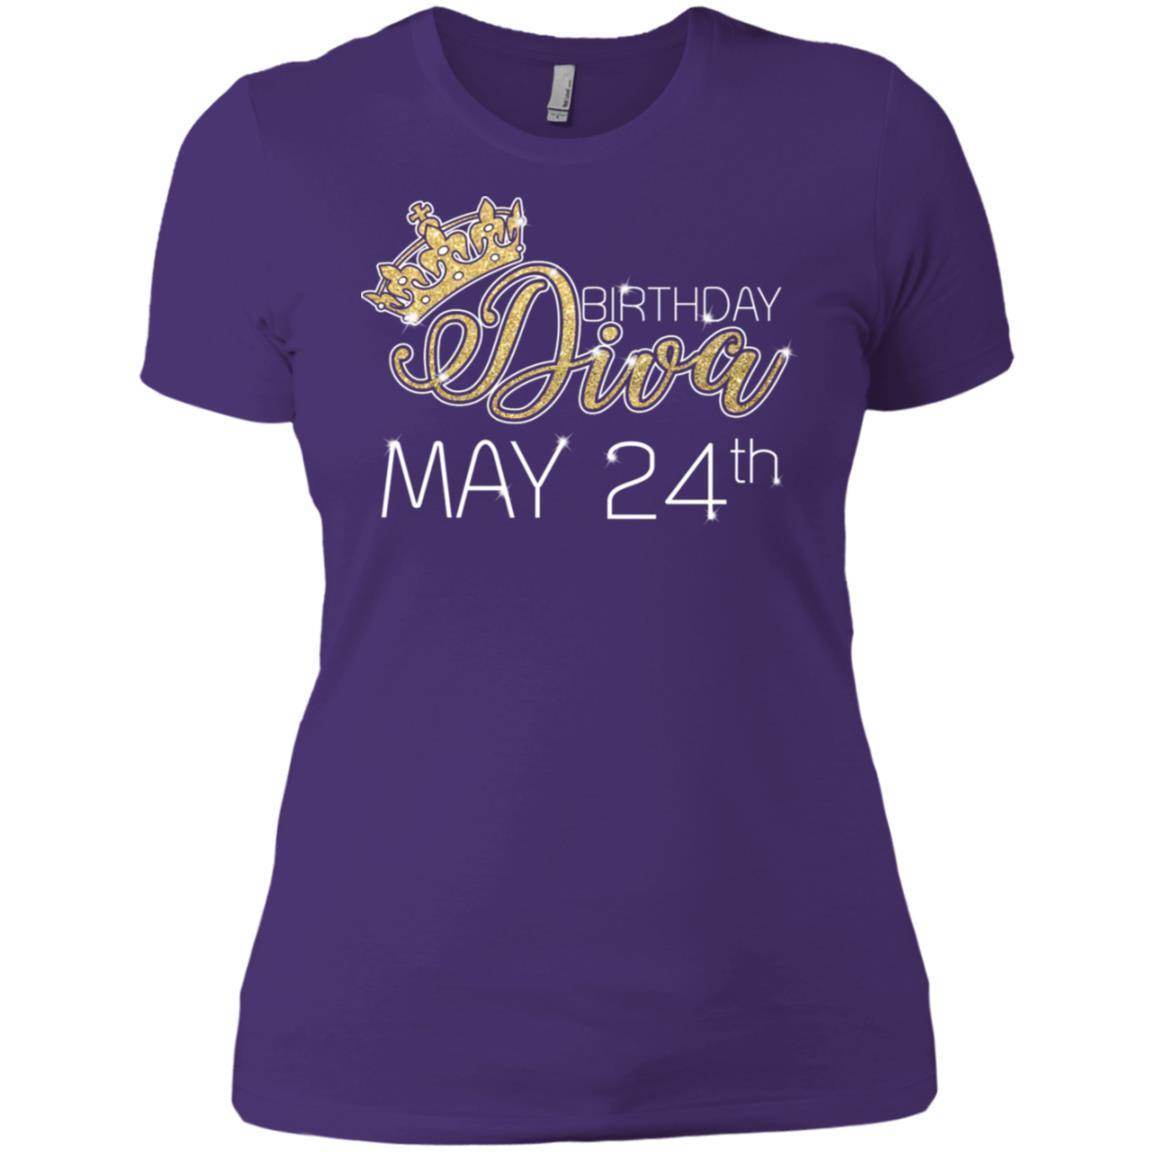 Birthday Diva on May 24th Taurus Pride Women Short Sleeve